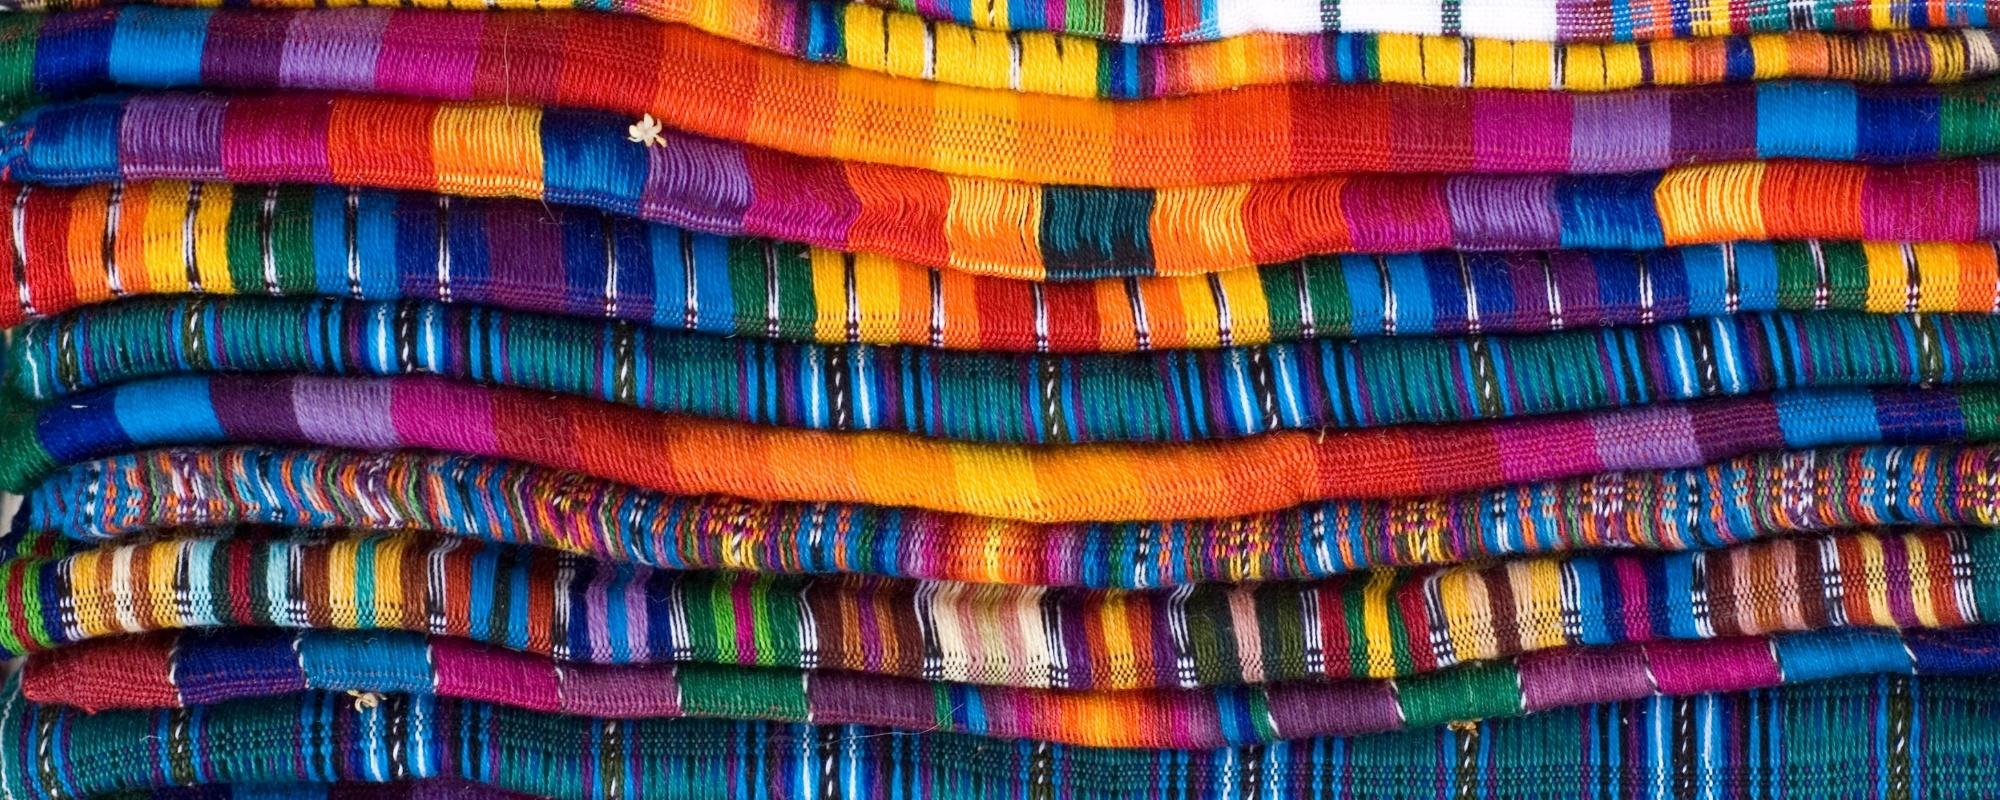 Mayan Cultural Blankets